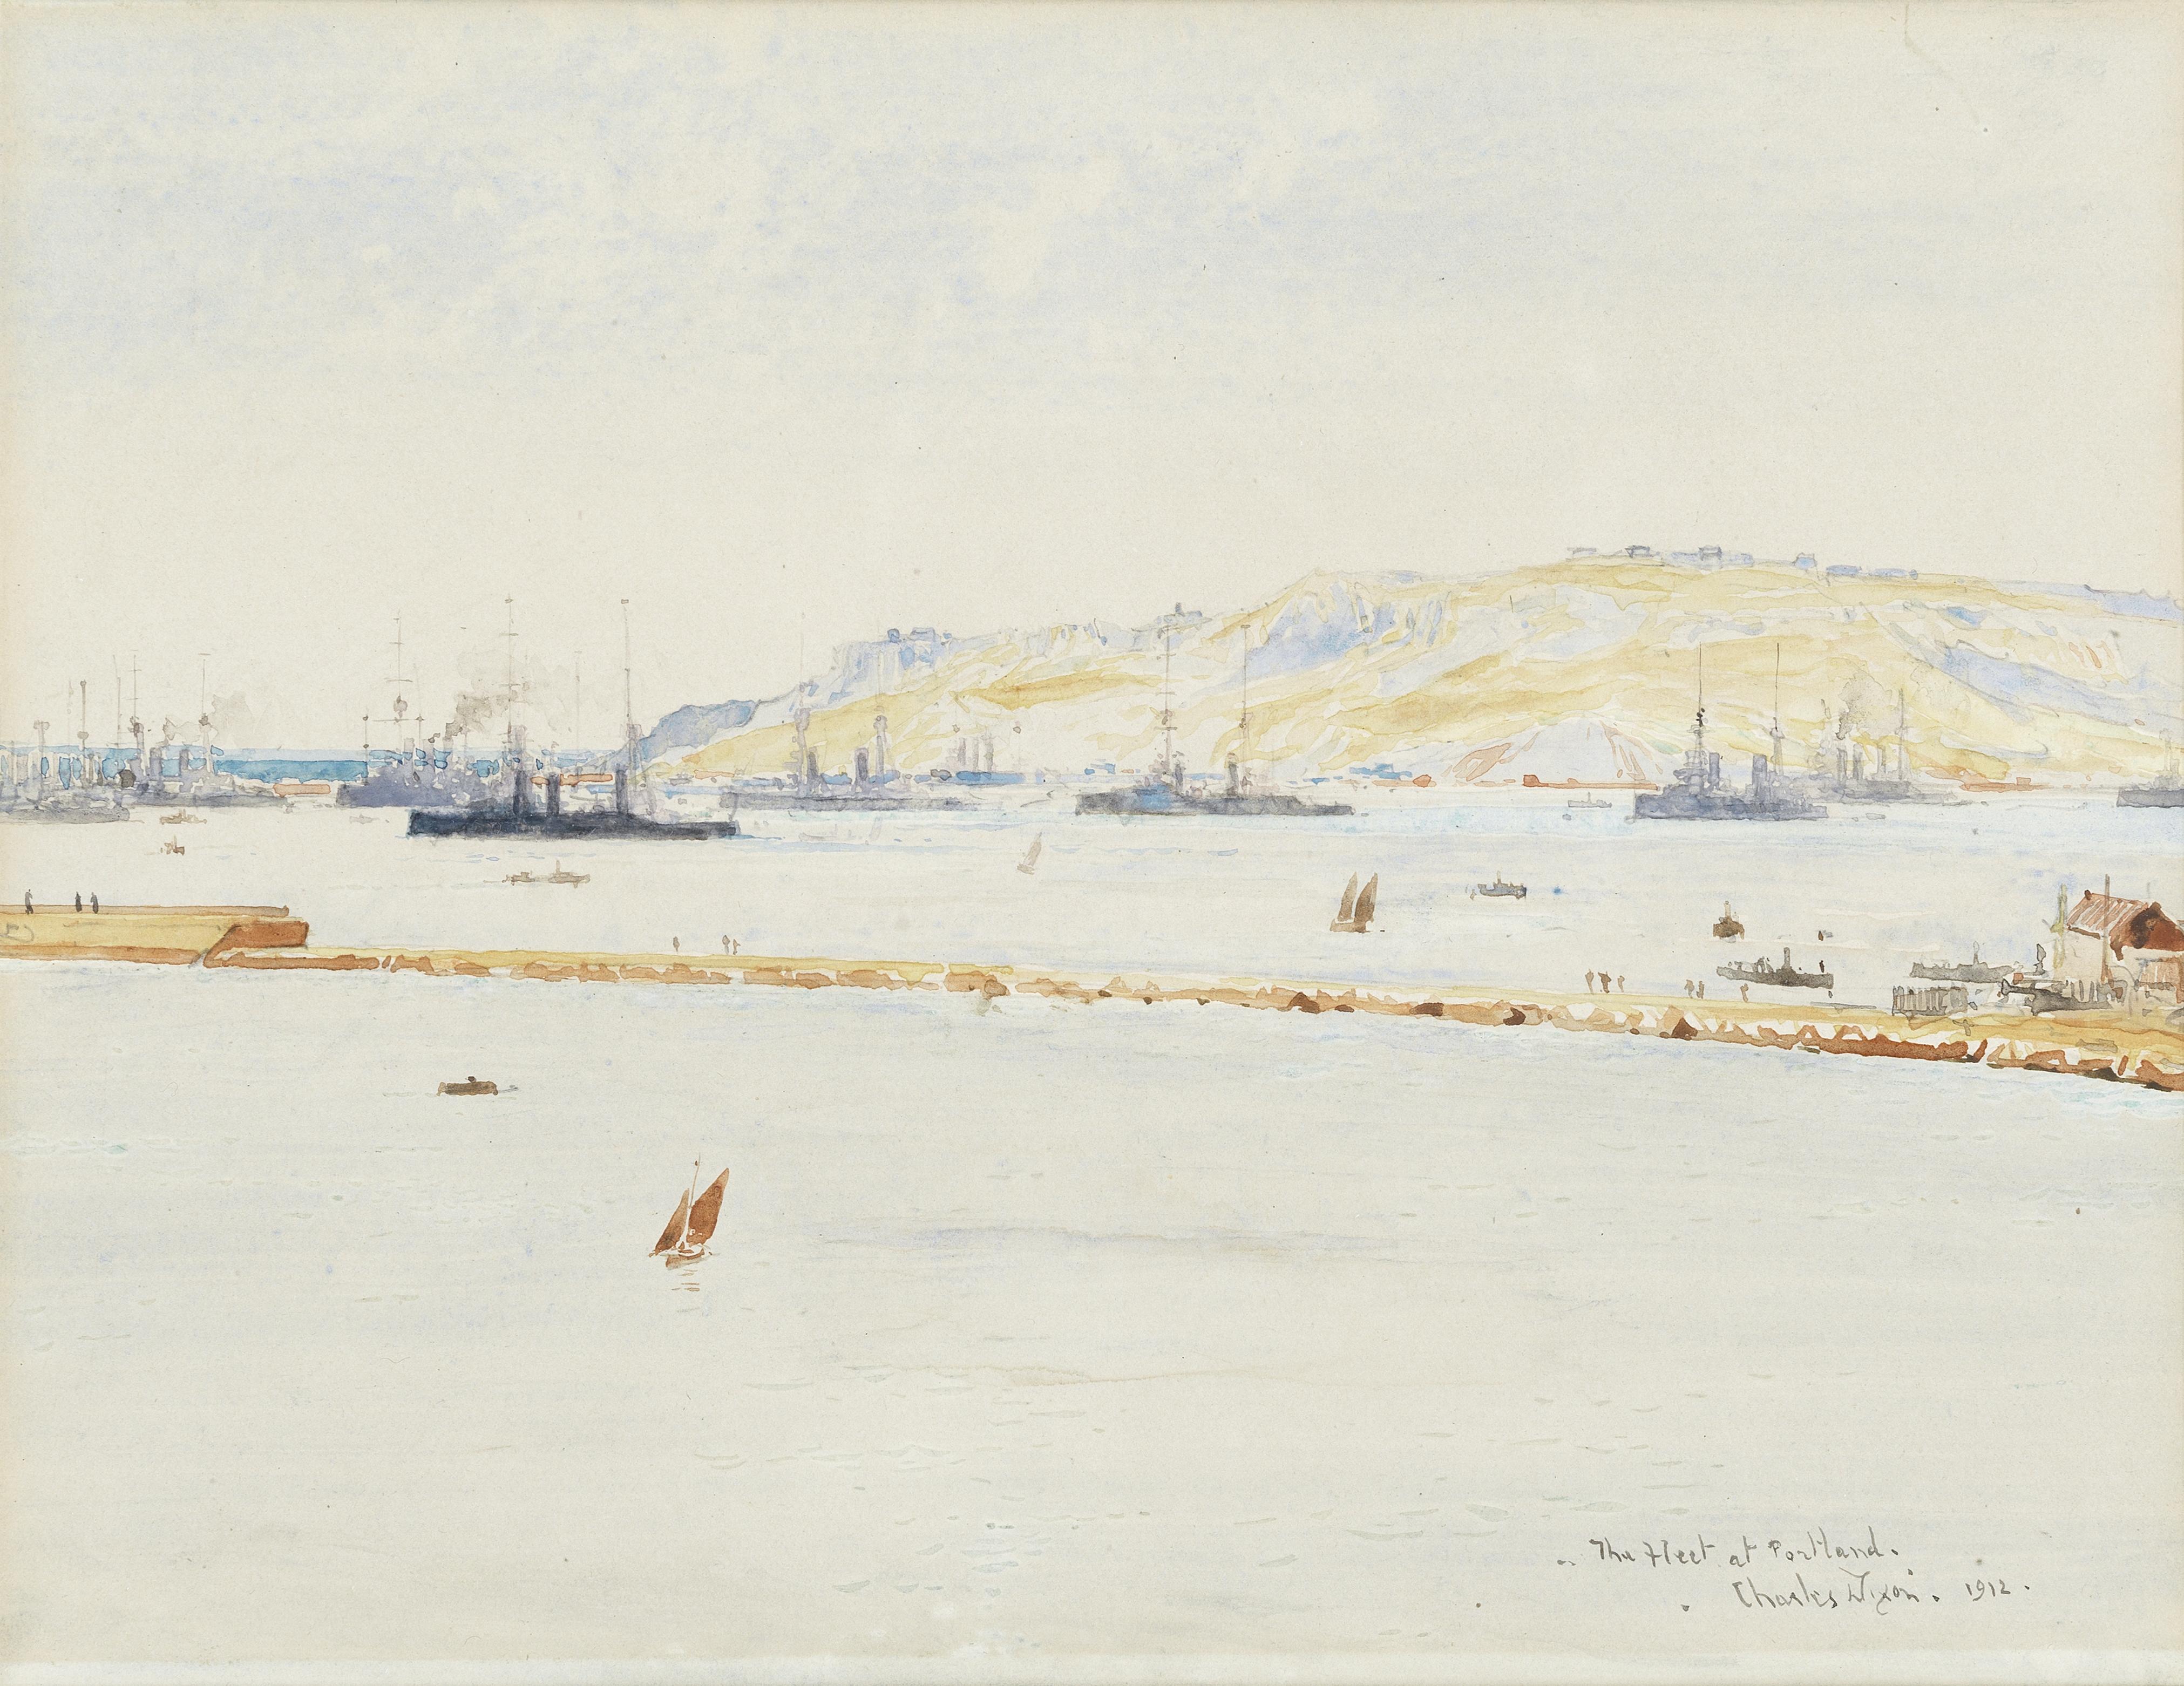 Charles Edward Dixon (British, 1872-1934) 'The Fleet at Portland', 1912